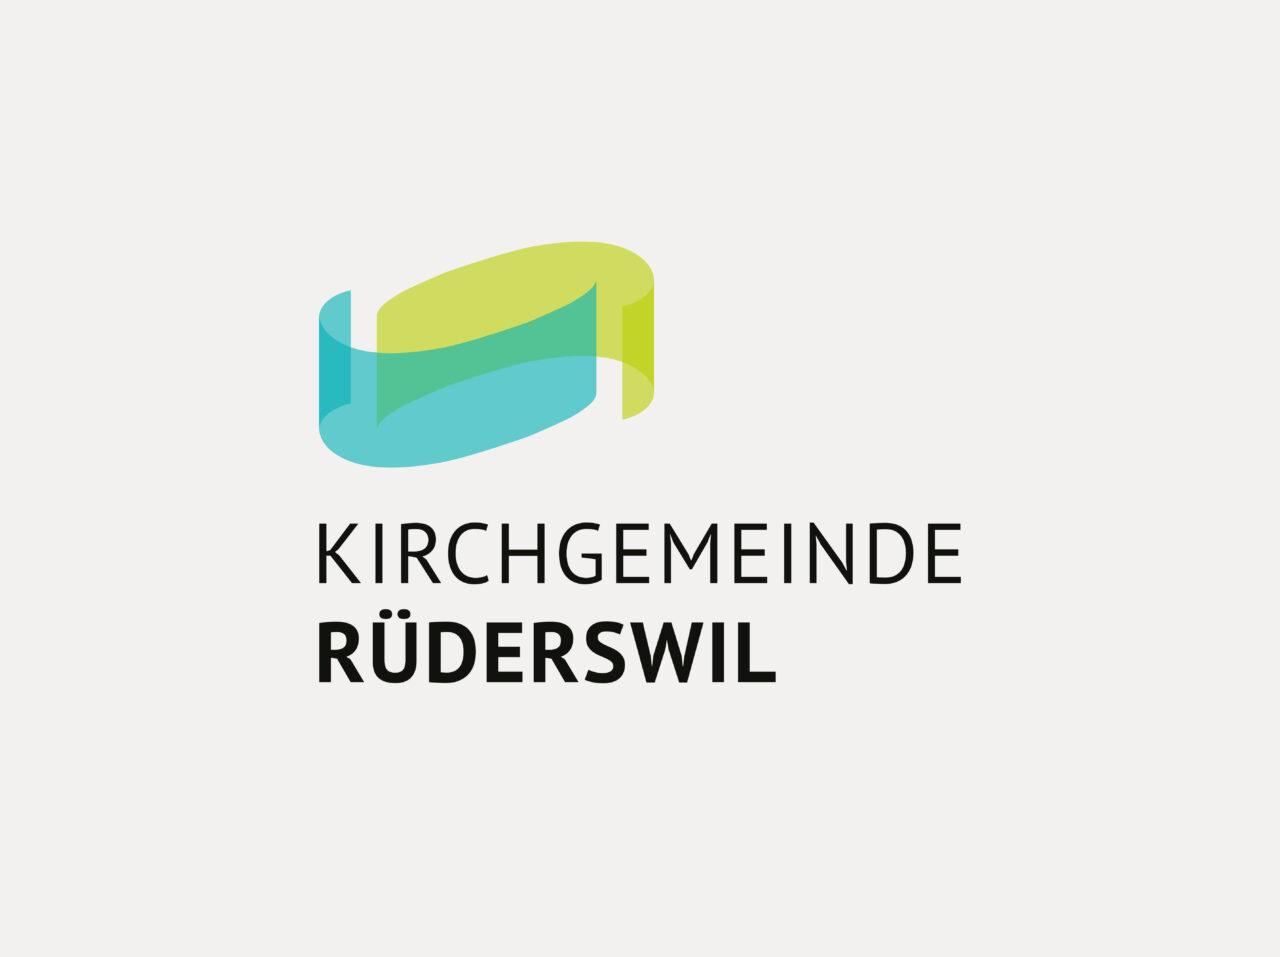 Logo Kirchgemeinde Rüderswil